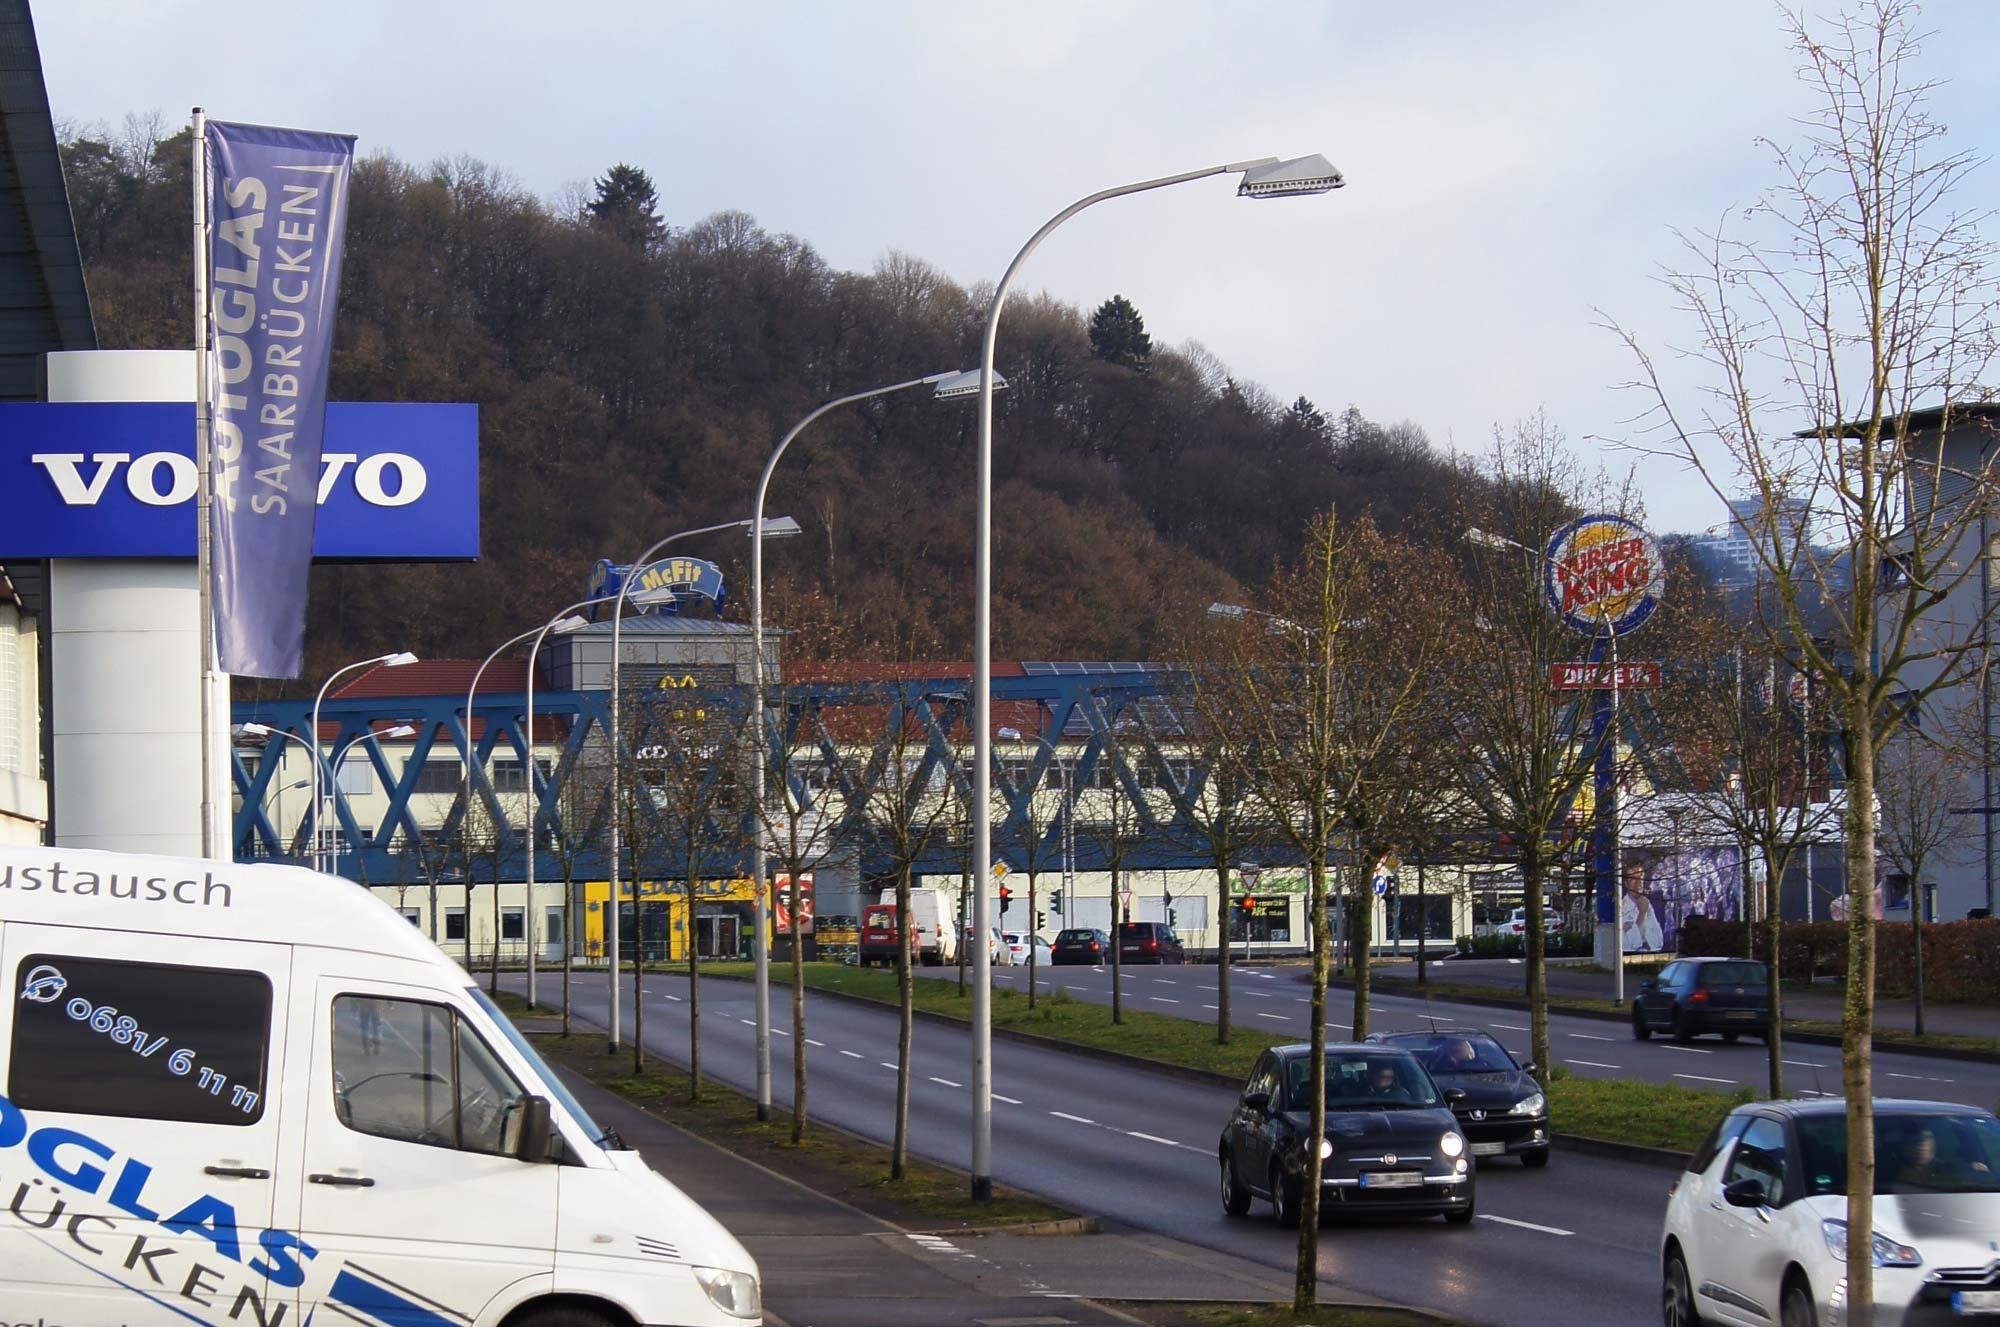 Autoglas Saarbrücken GmbH